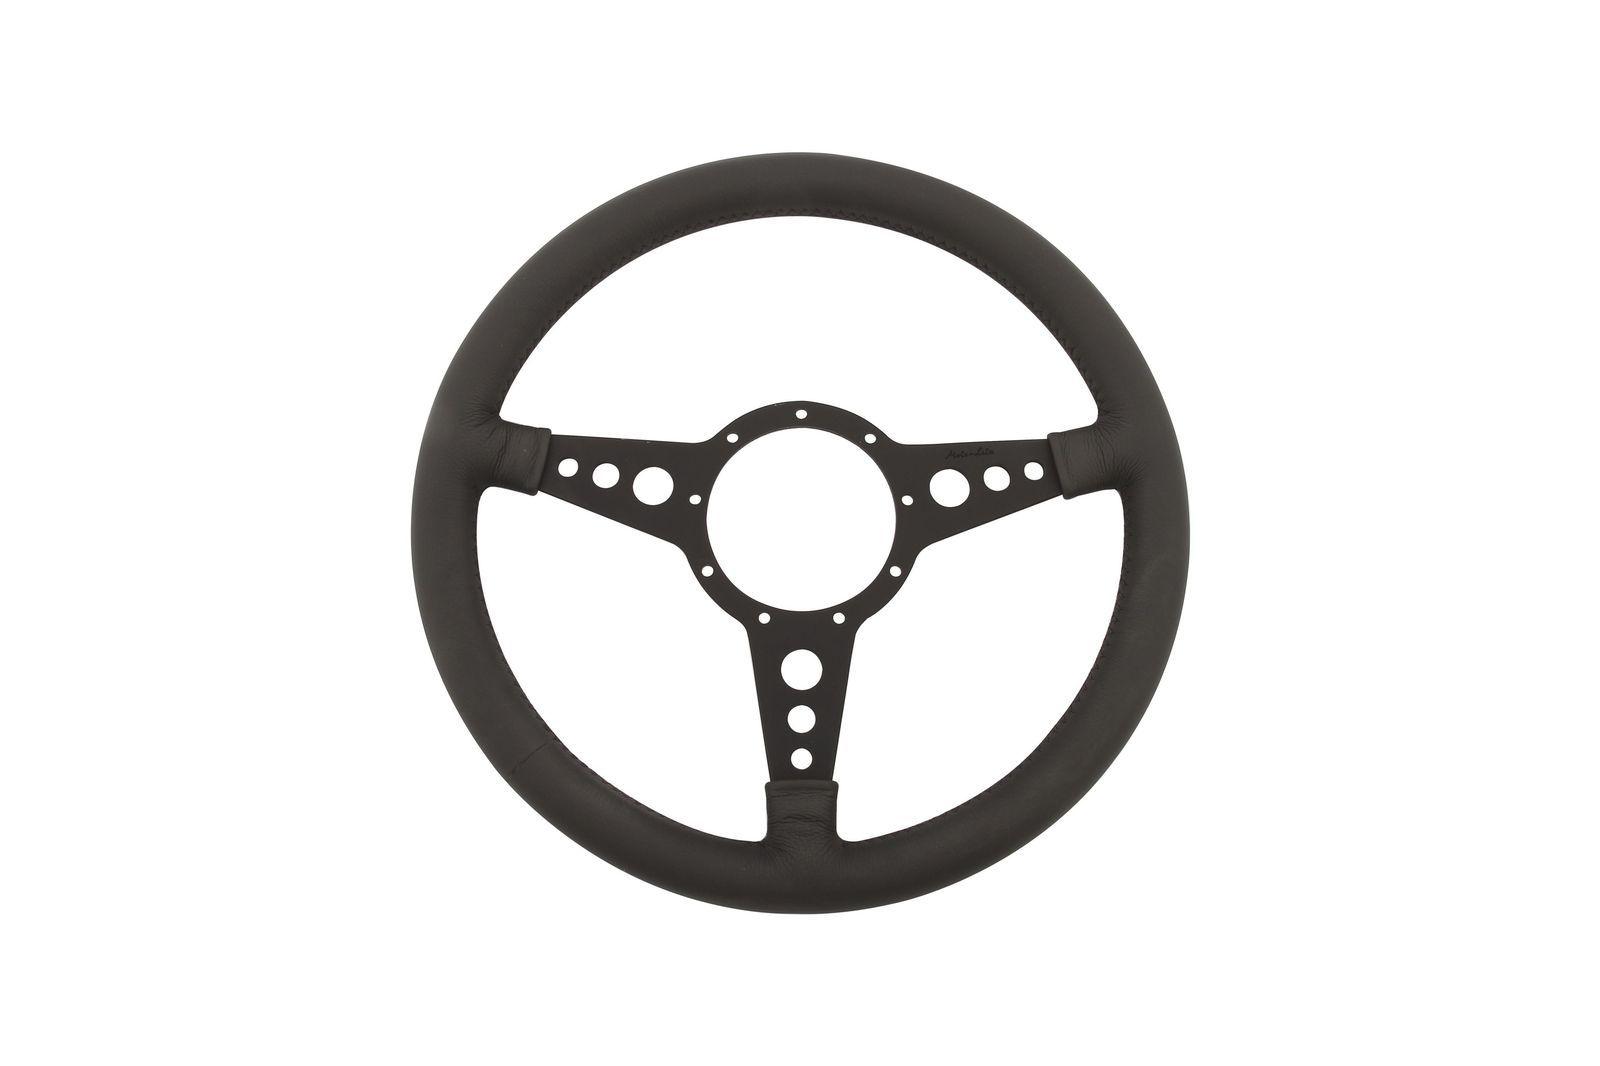 "#Leder-Lenkrad Moto-Lita flach 14"" gelocht schwarz           , ML4FBD14"